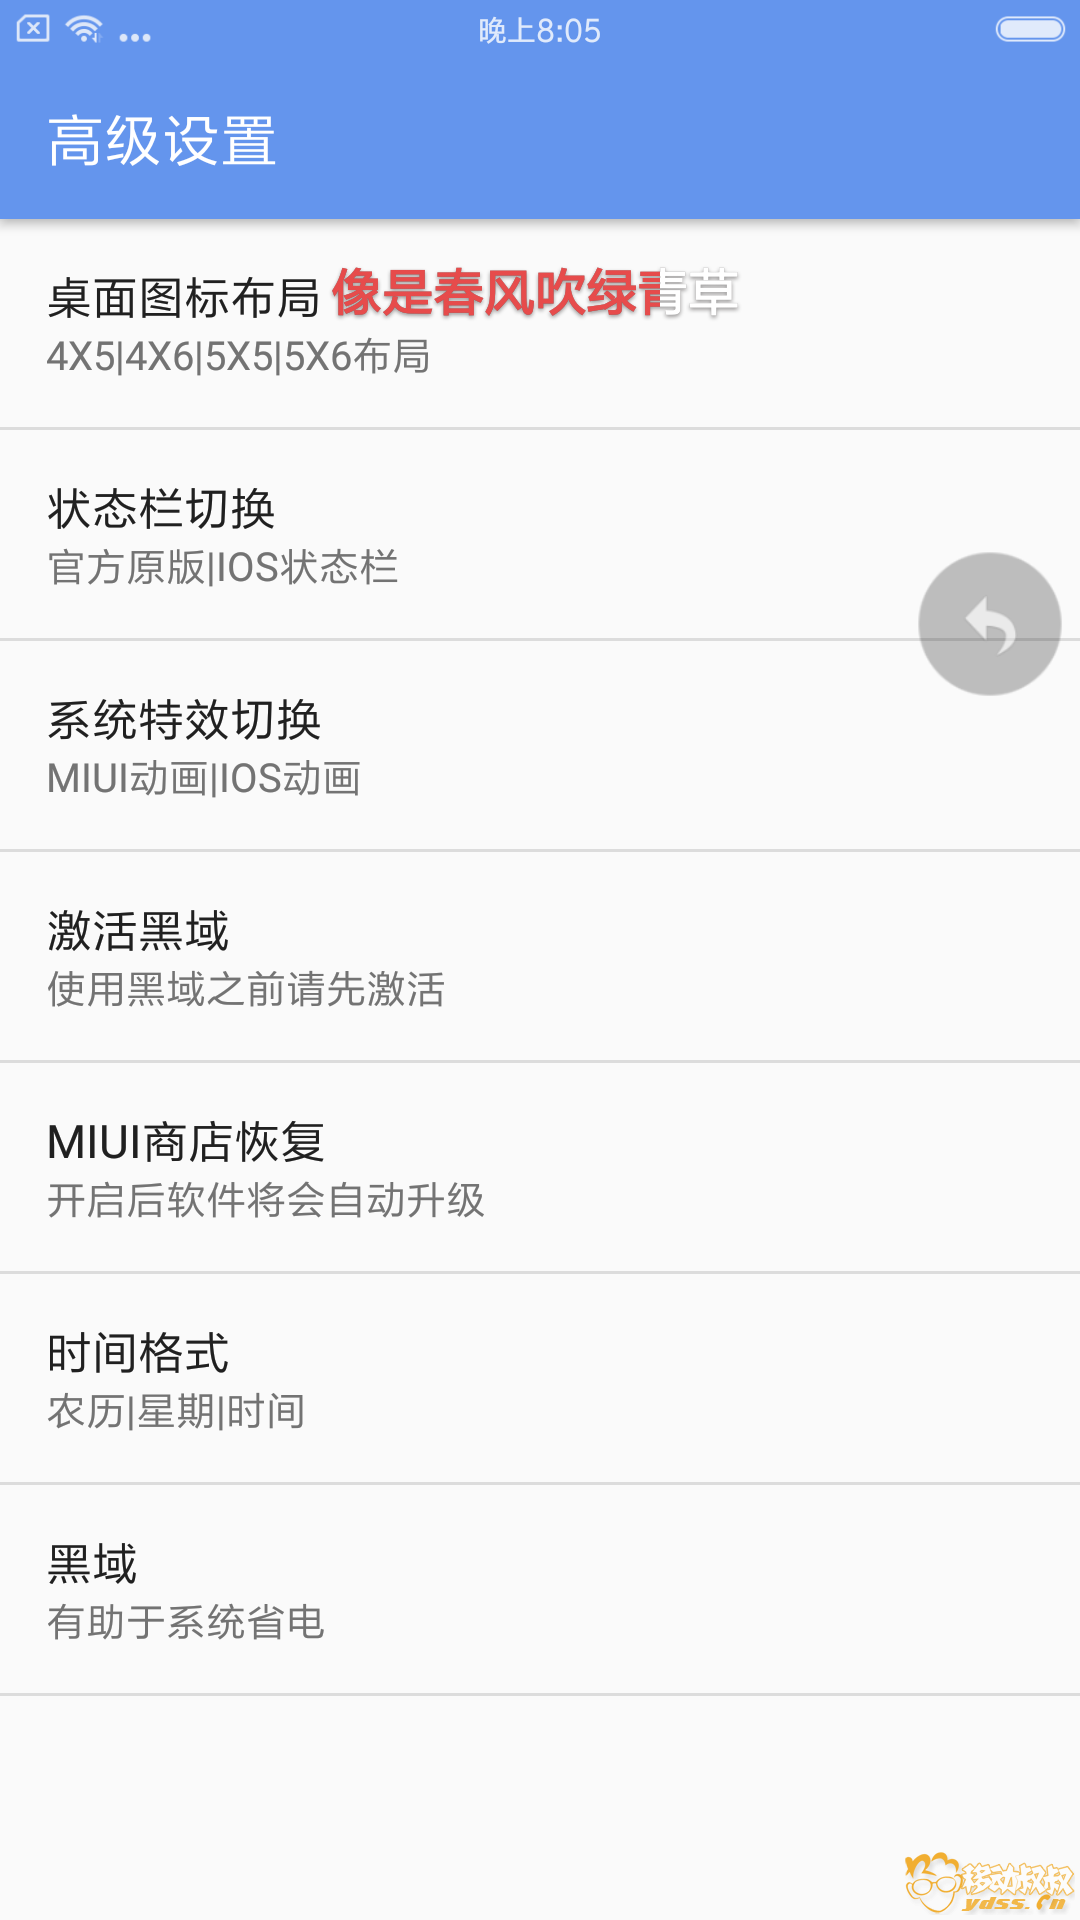 Screenshot_2018-01-27-20-05-14-763_com.mrxy.design.png